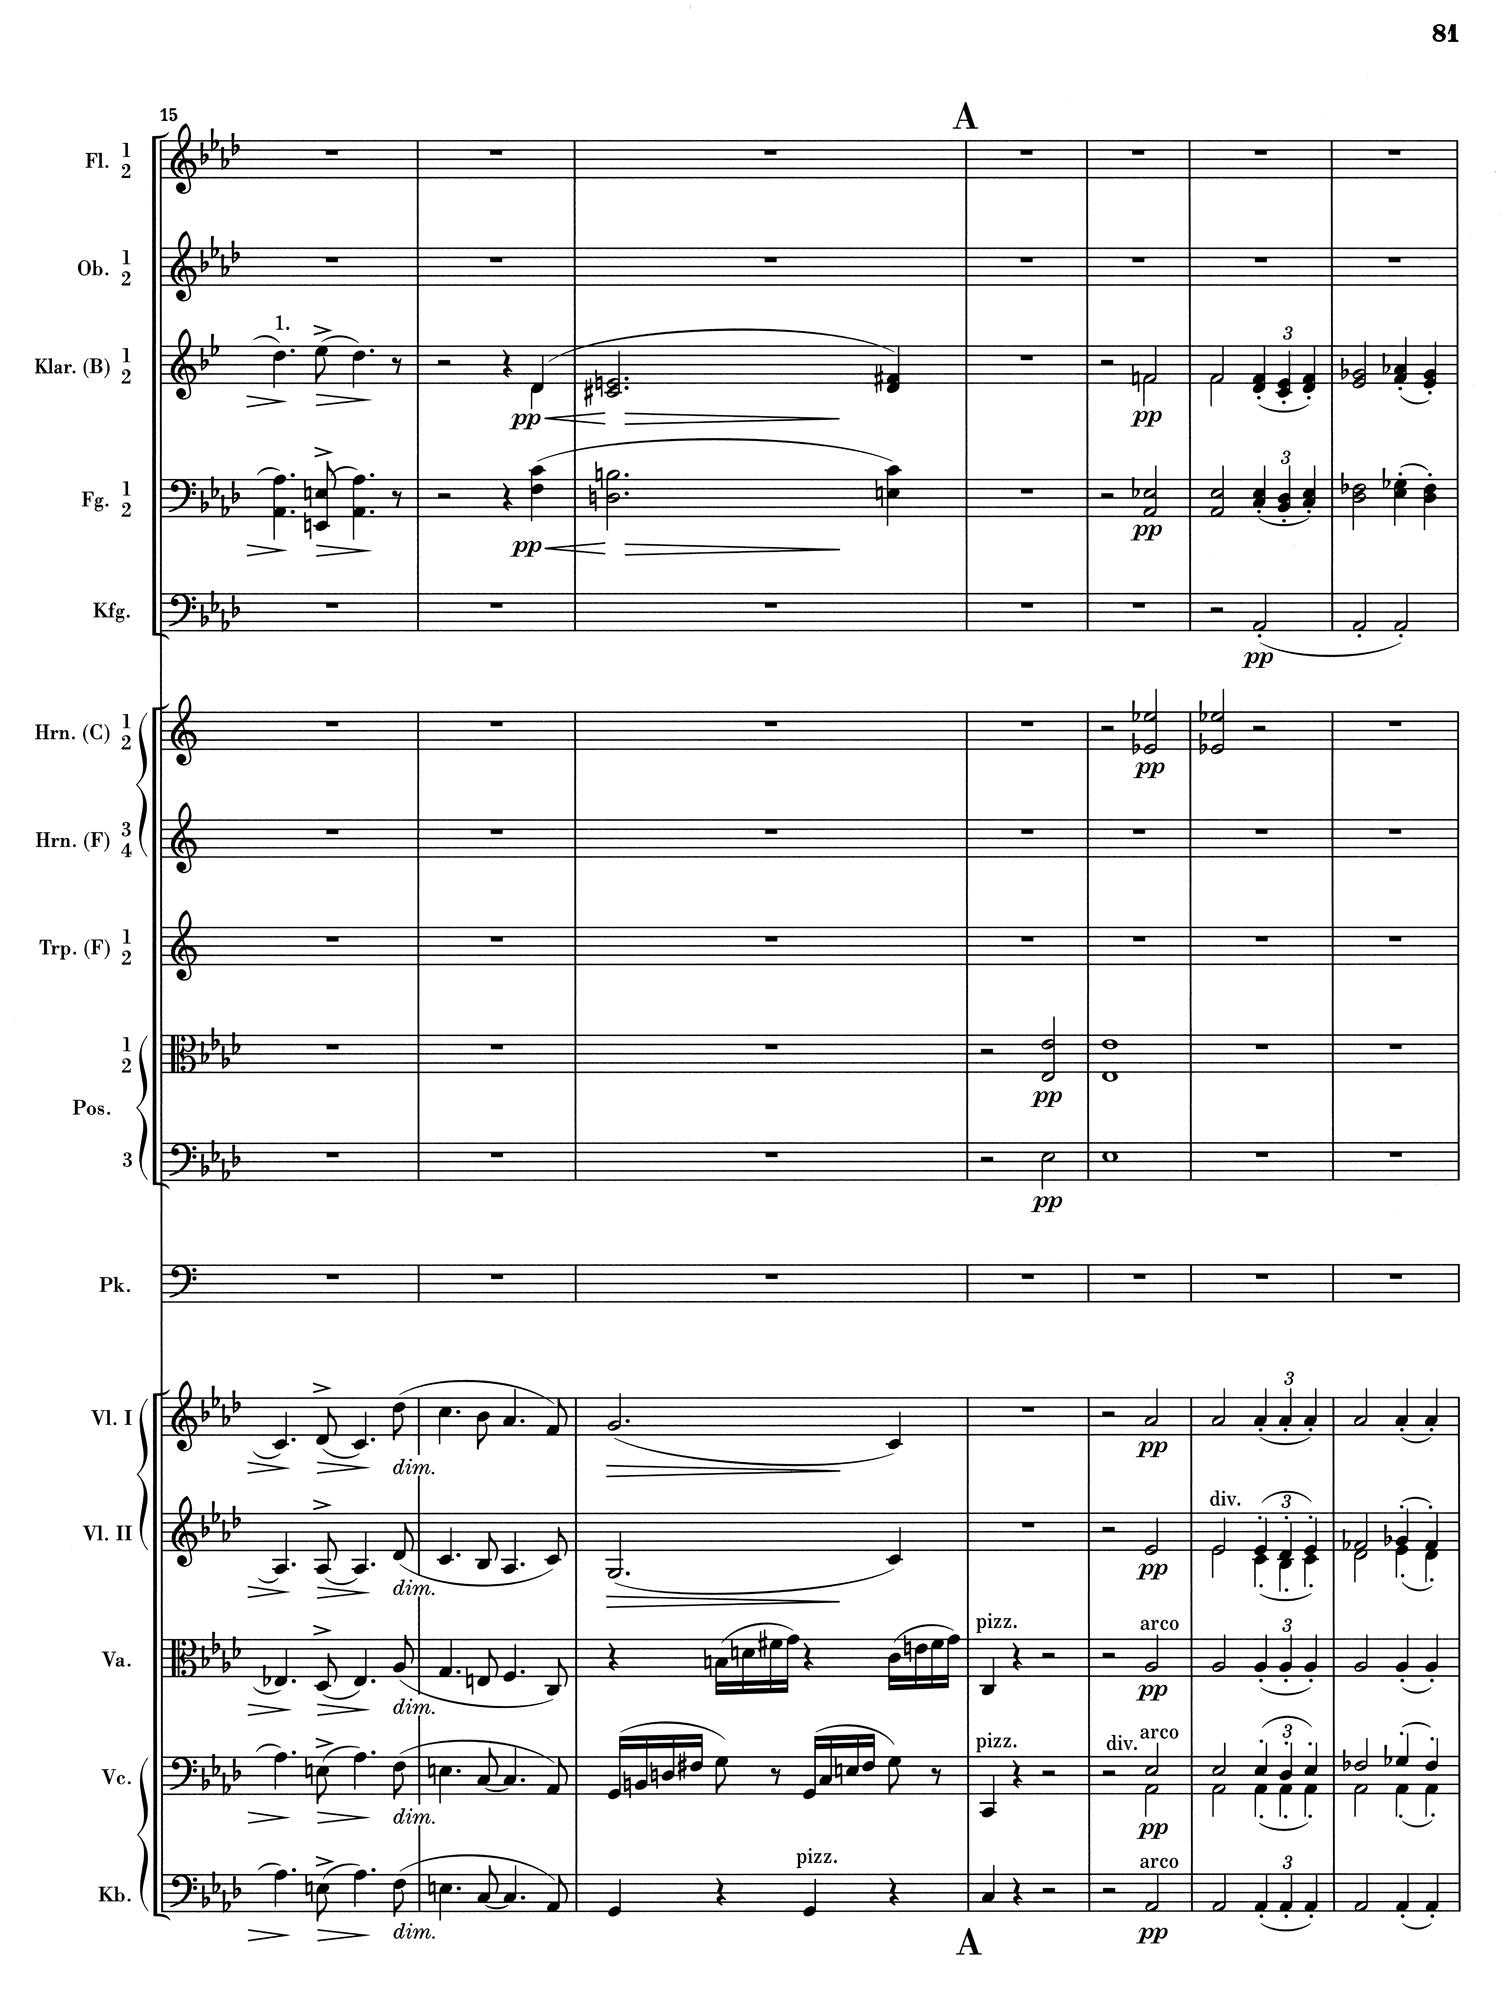 Brahms 3 Score 10.jpg